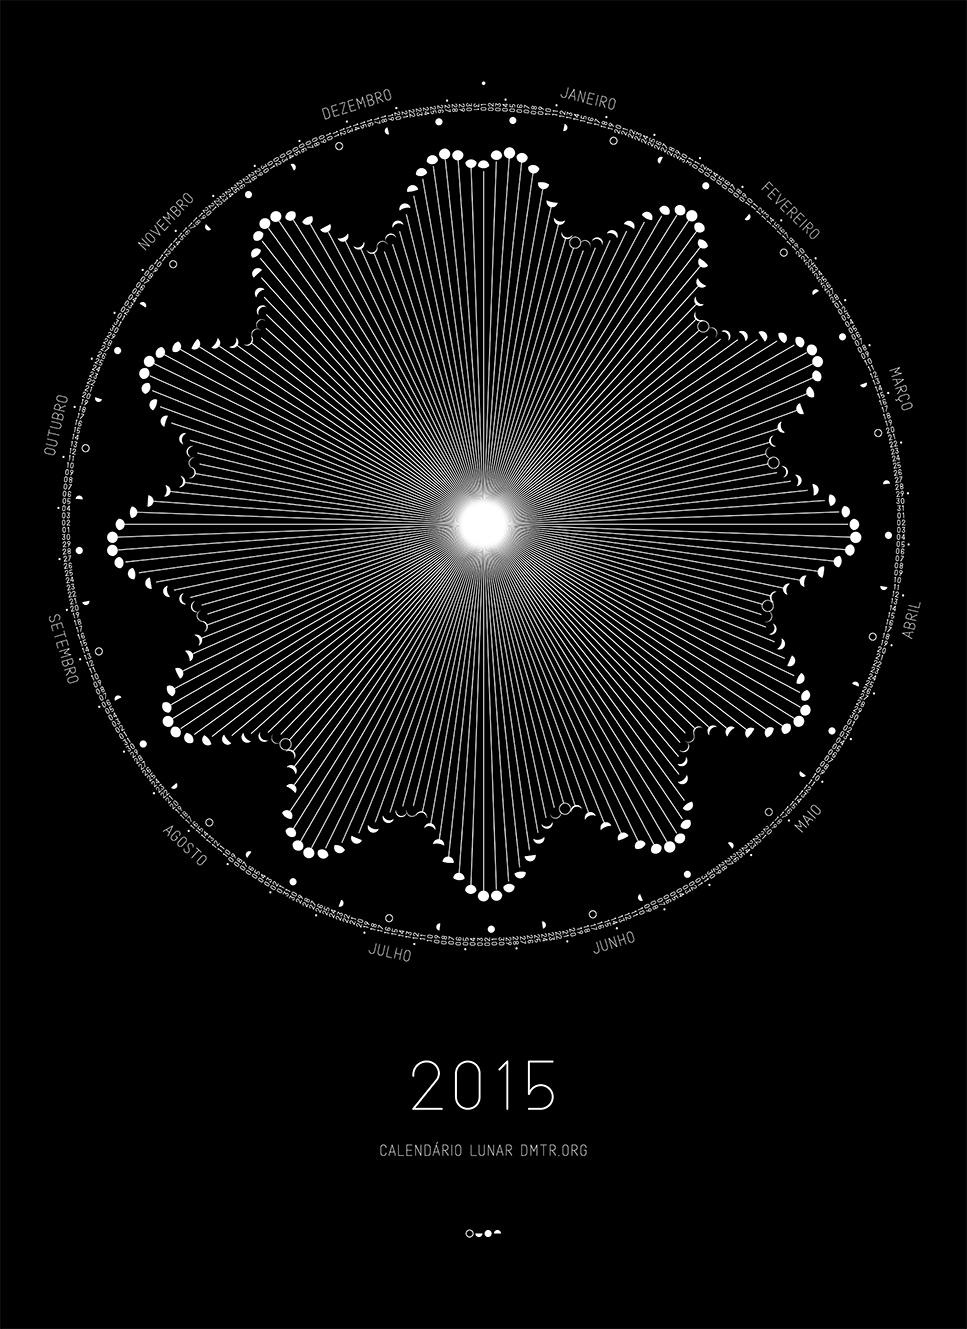 lunar2015_dmtr.org.jpg